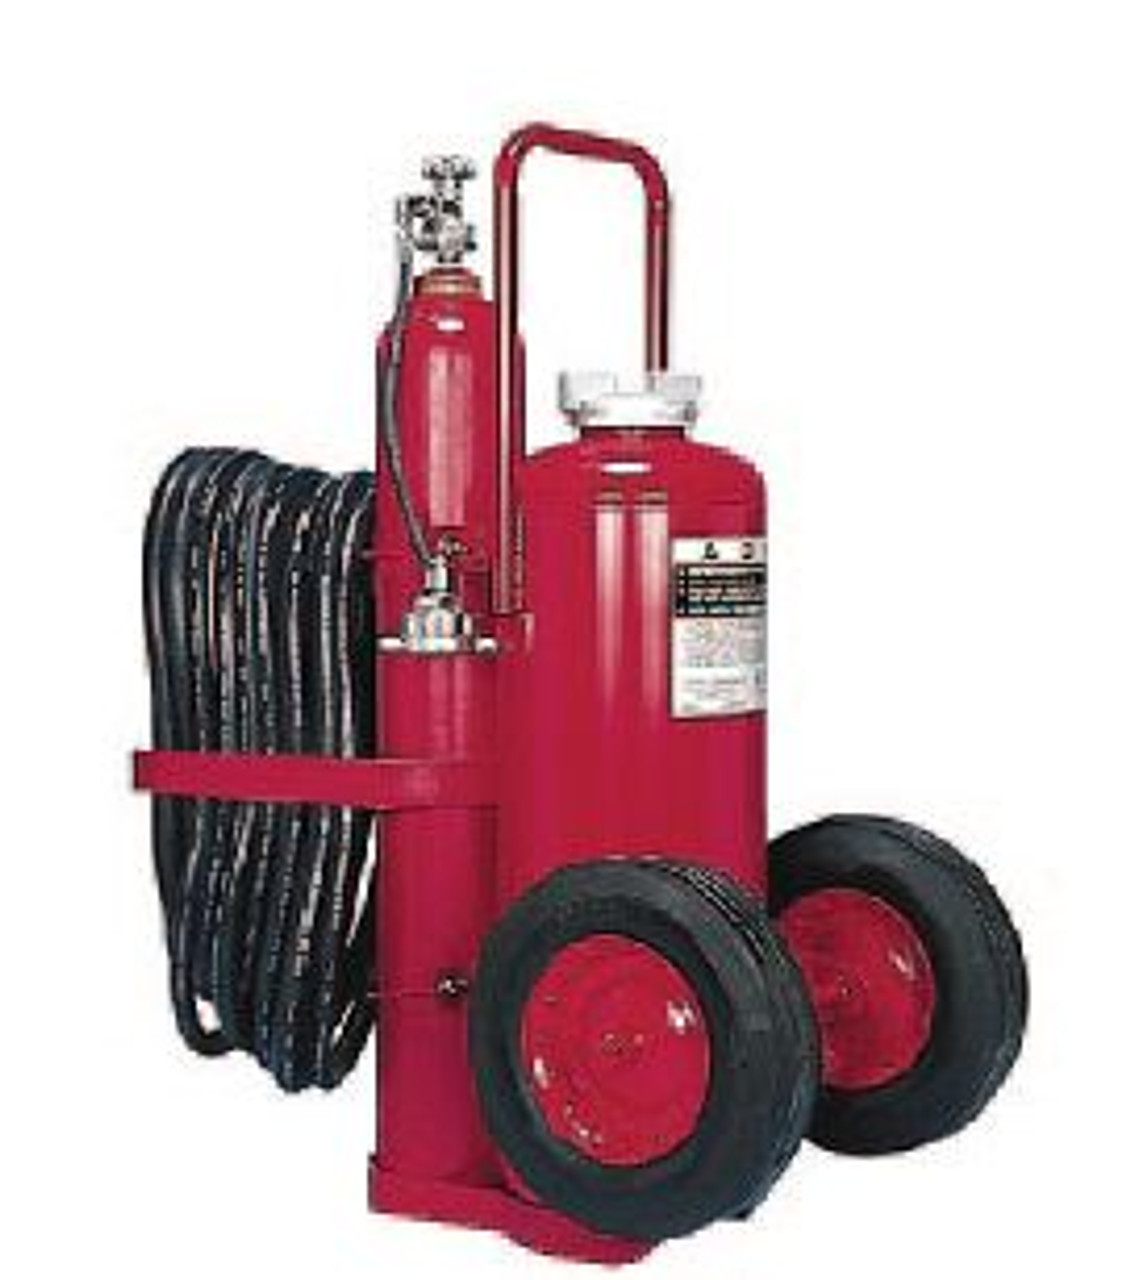 Amerex 468 - 150 LB Nitrogen Cylinder Wheeled Fire Extinguisher